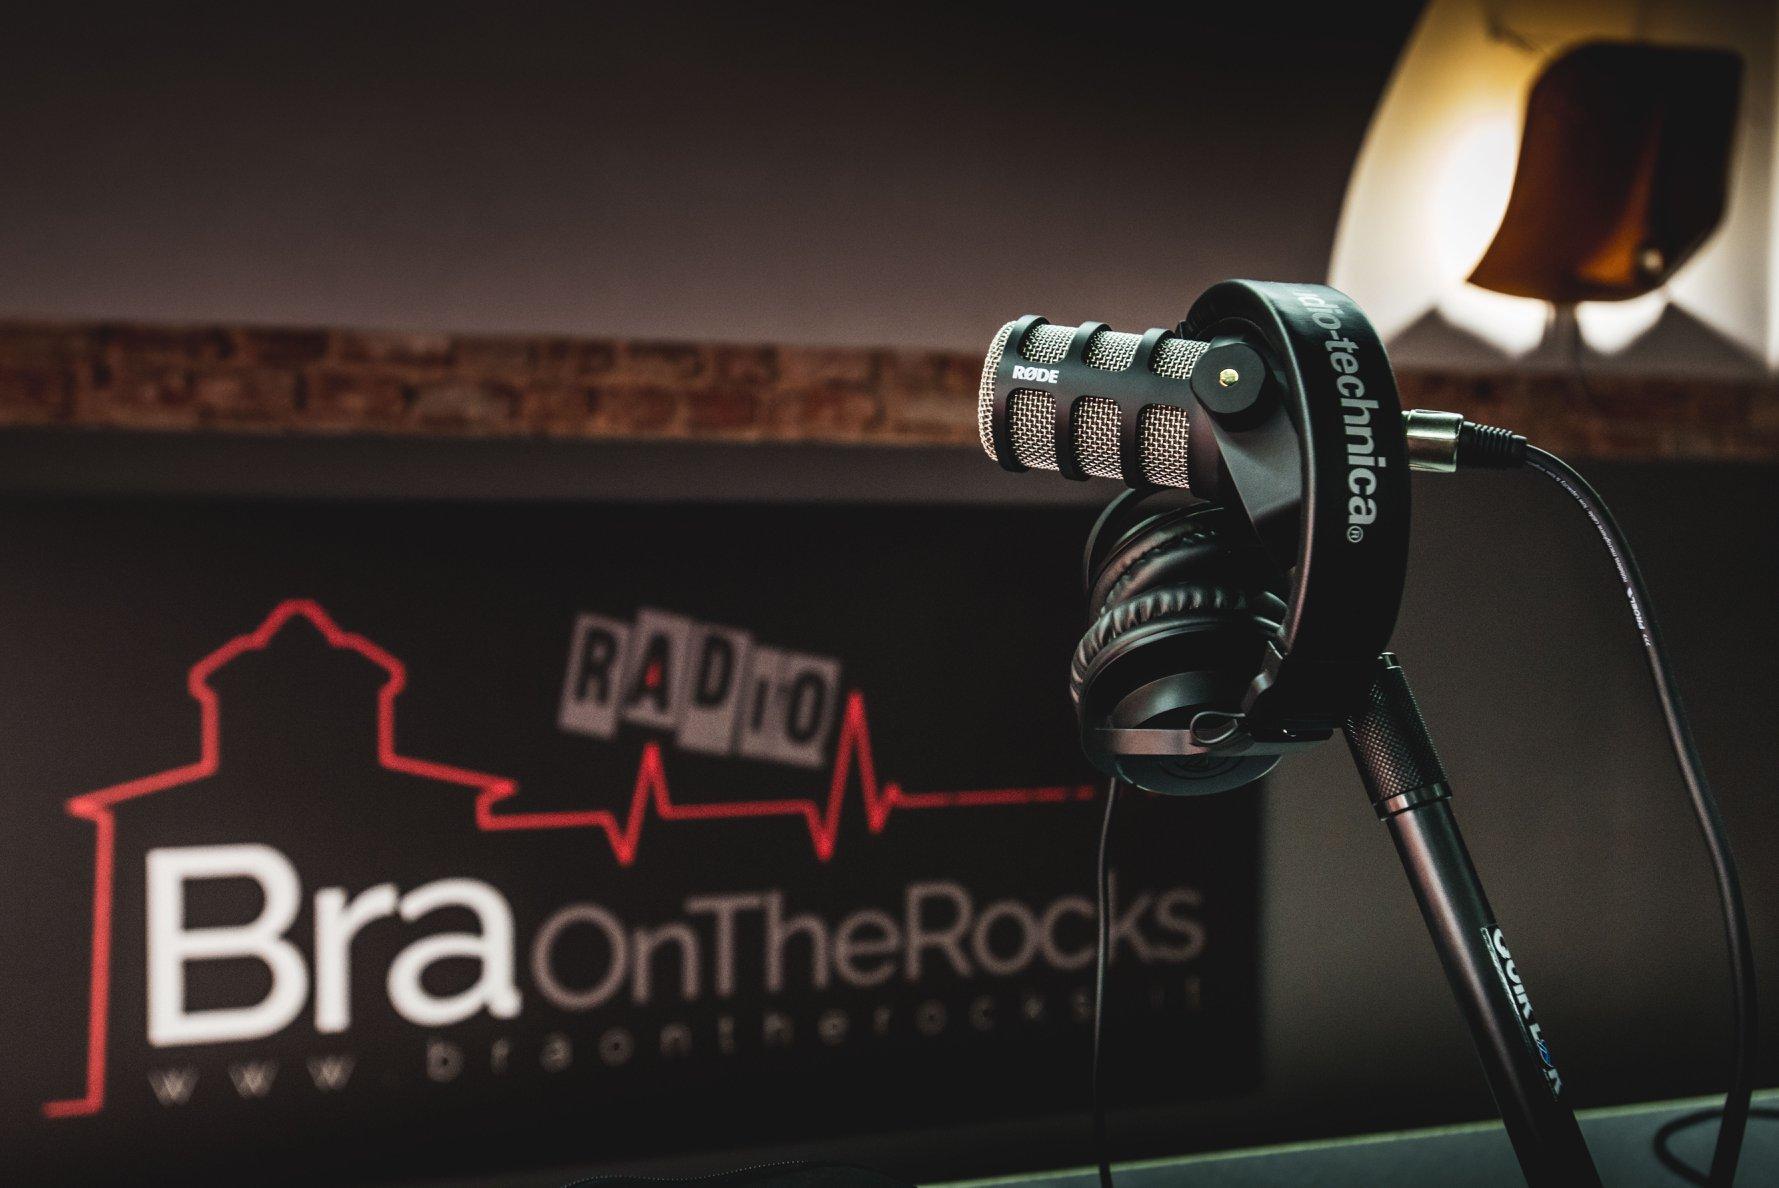 Bra on the school: studenti braidesi alla scoperta del mondo radiofonico - IdeaWebTv